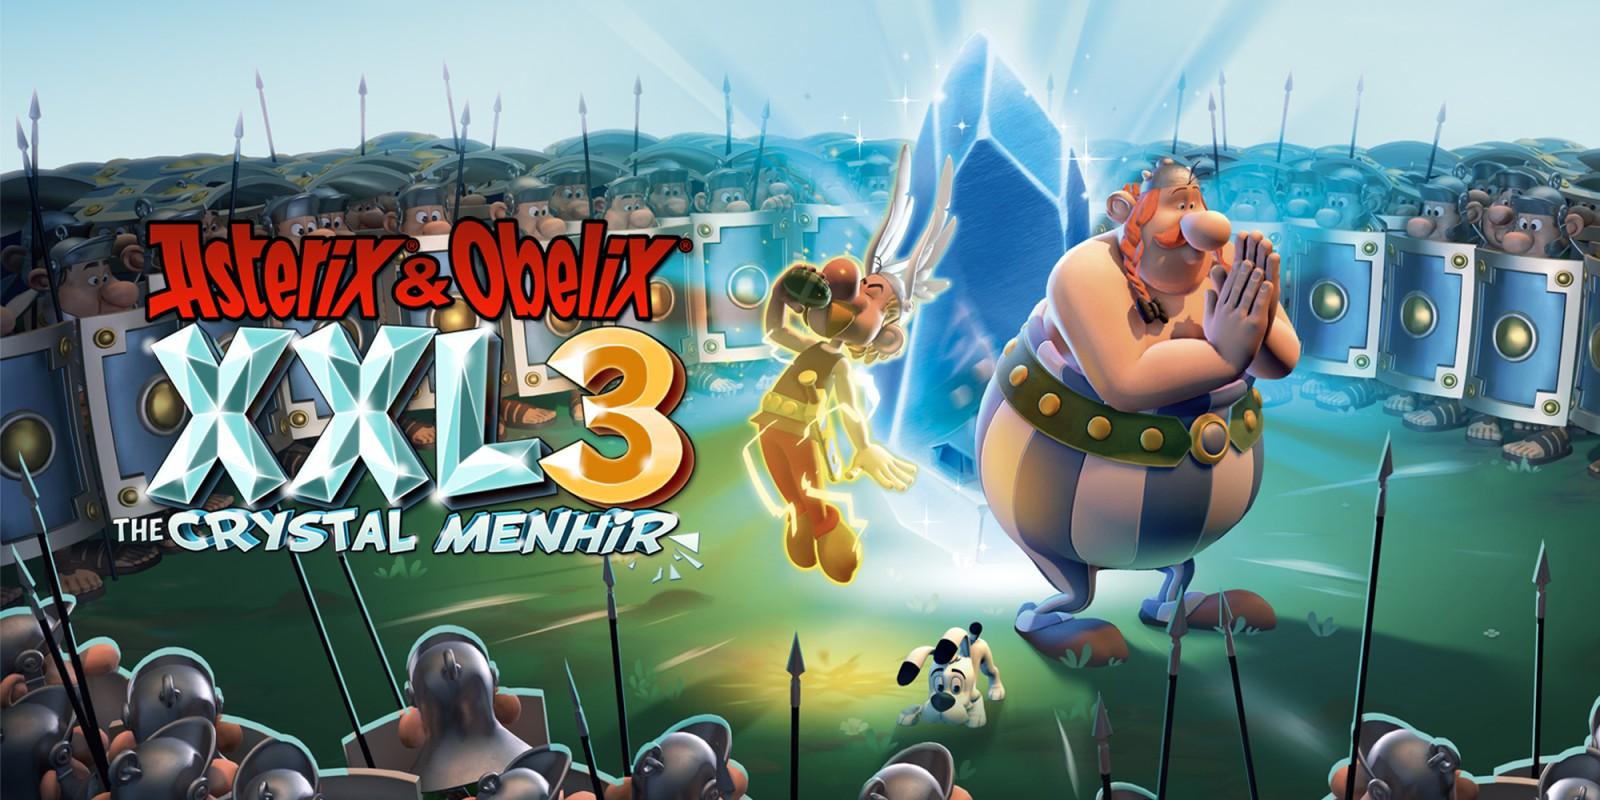 Análisis de Asterix y Obelix XXL 3: The Crystal Menhir